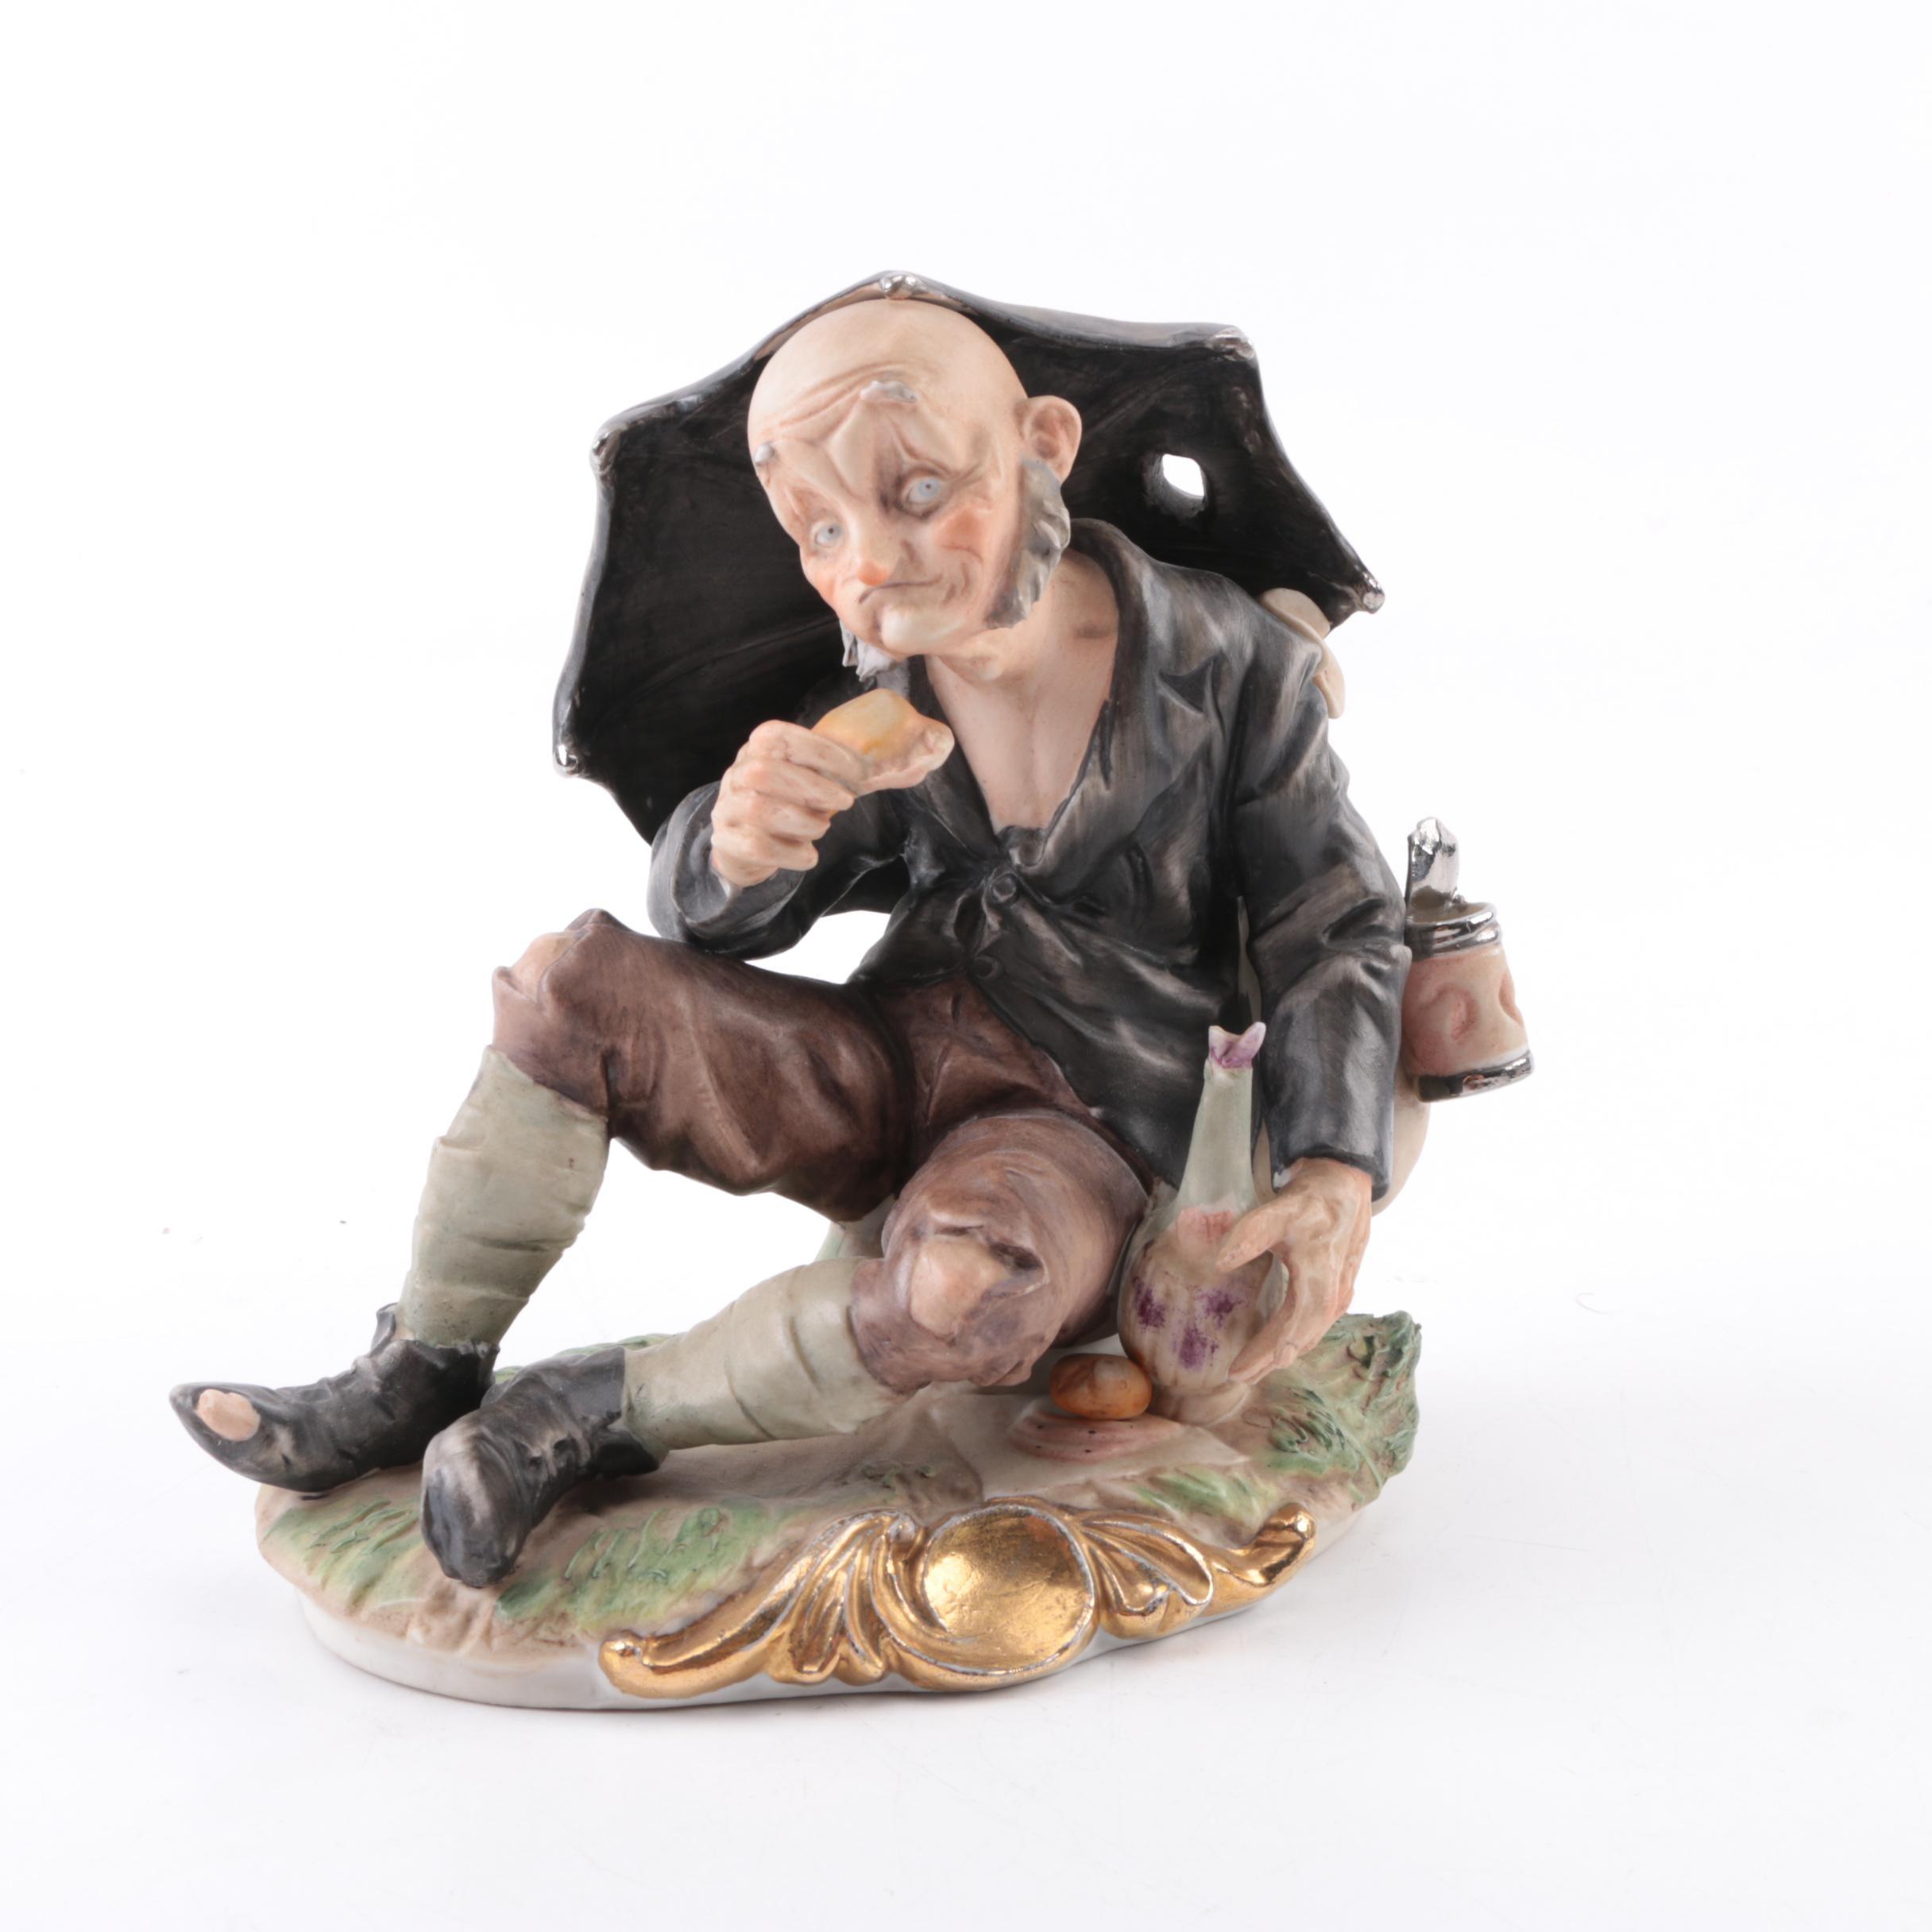 Old Man Ceramic Figurine